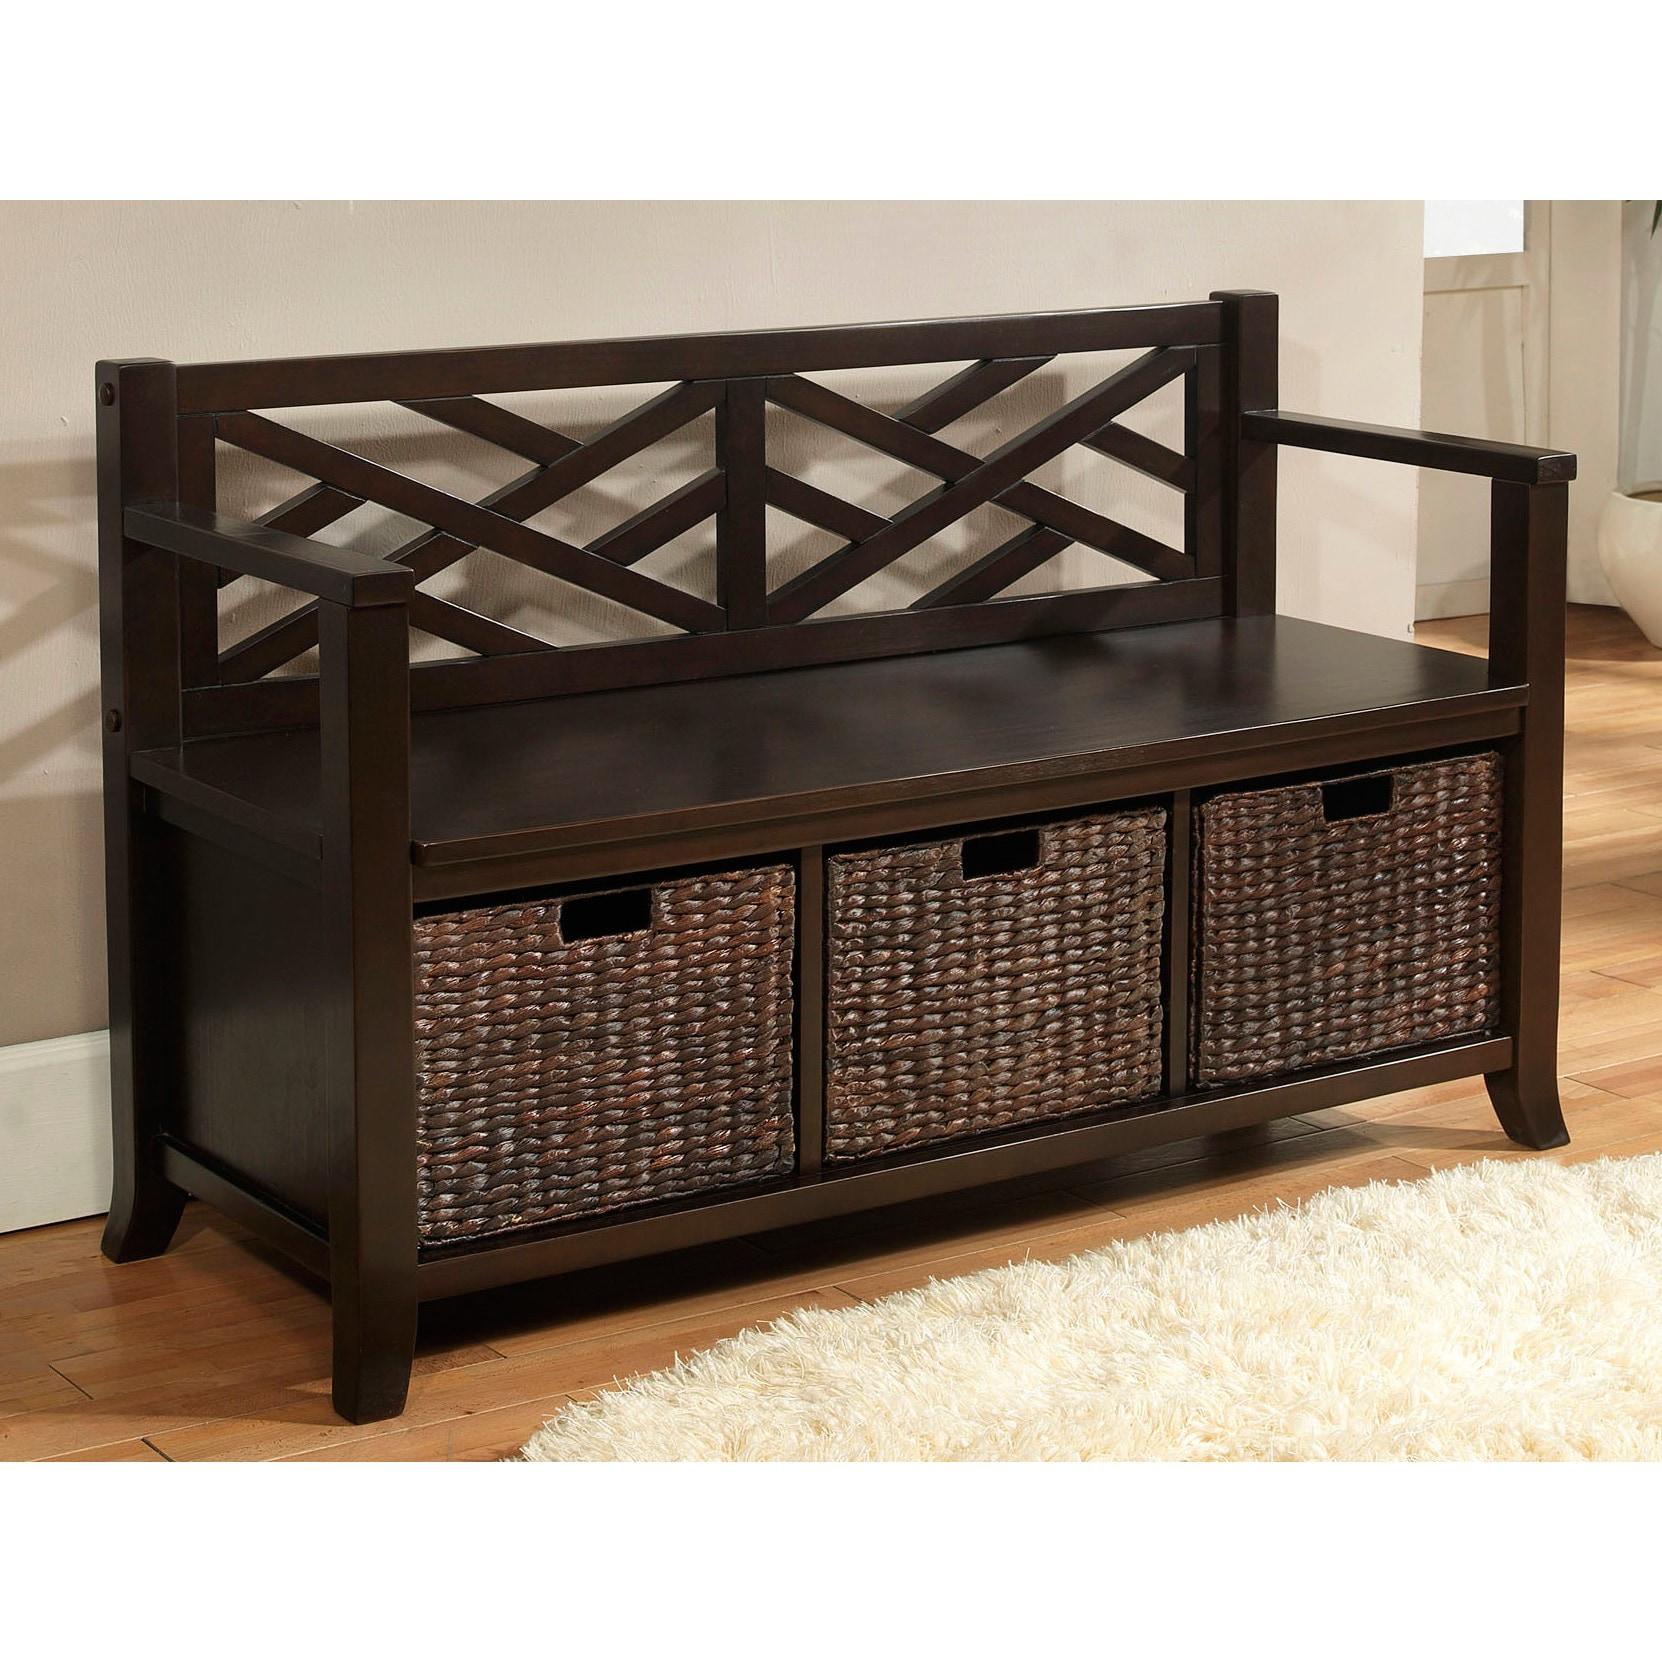 Espresso Foyer Bench : Nolan espresso brown entryway storage bench with basket